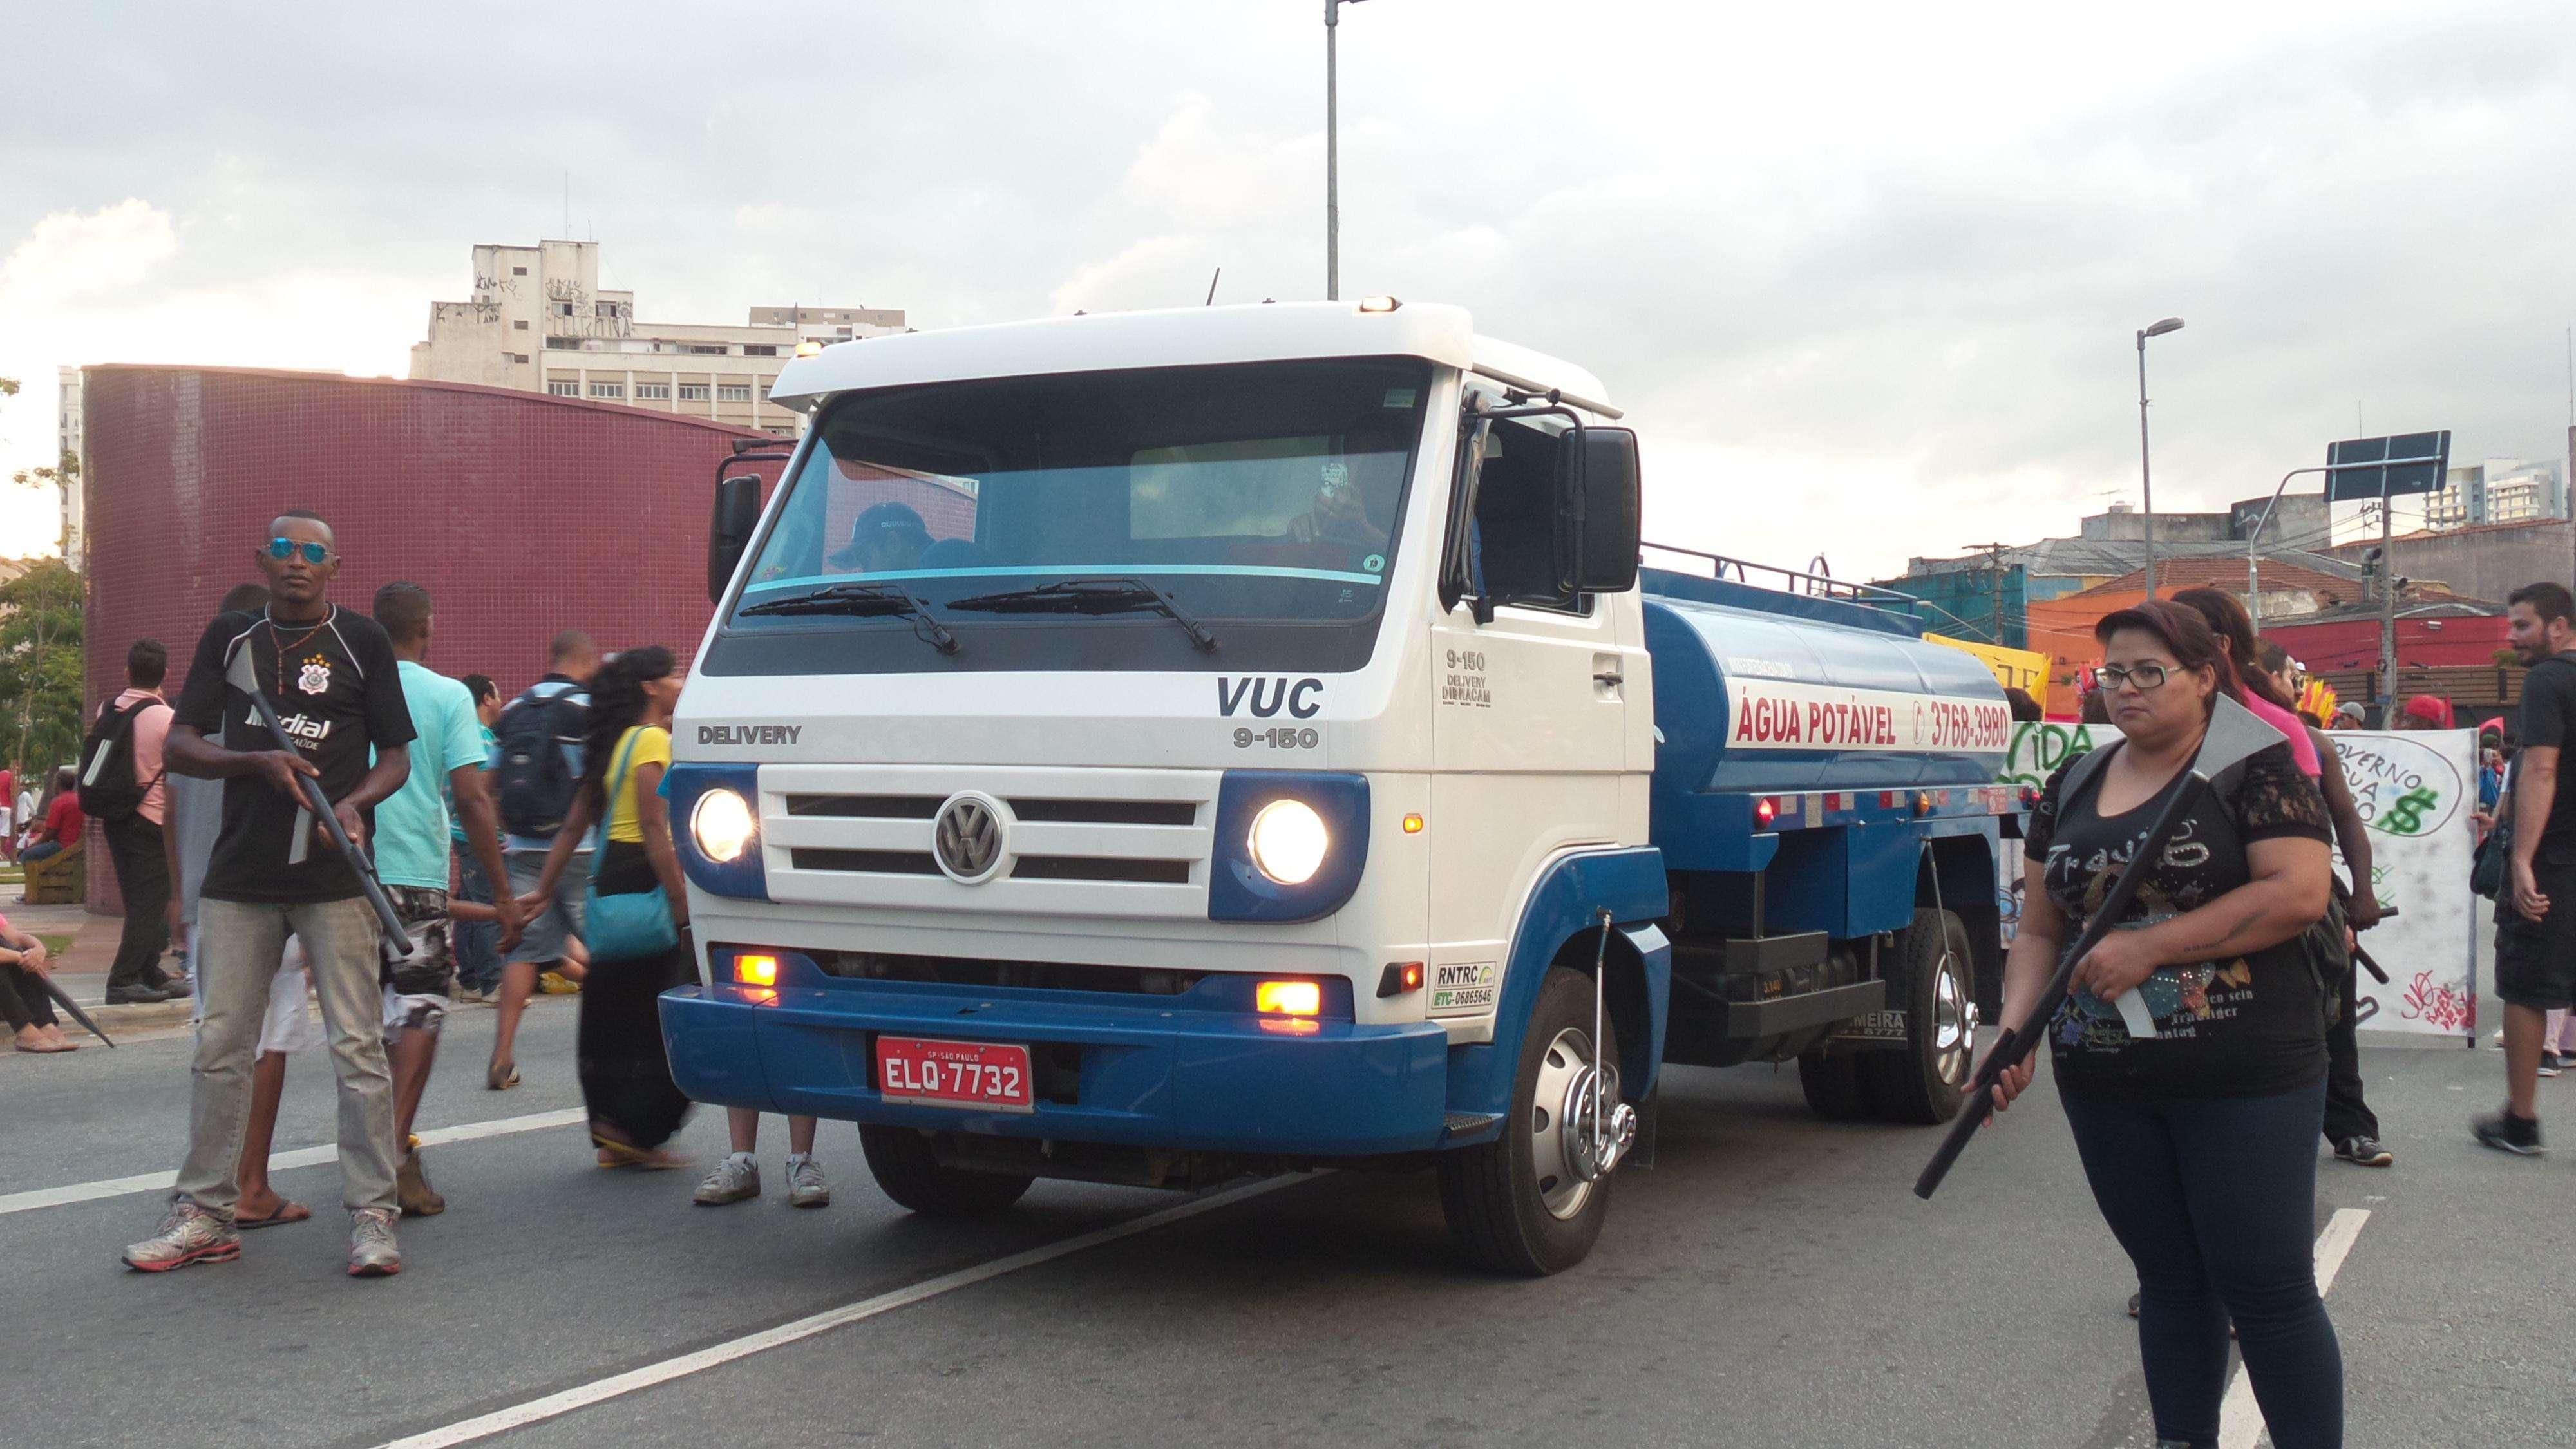 Caminhão-pipa teve escolta de brincadeira durante o protesto Foto: Janaina Garcia/Terra